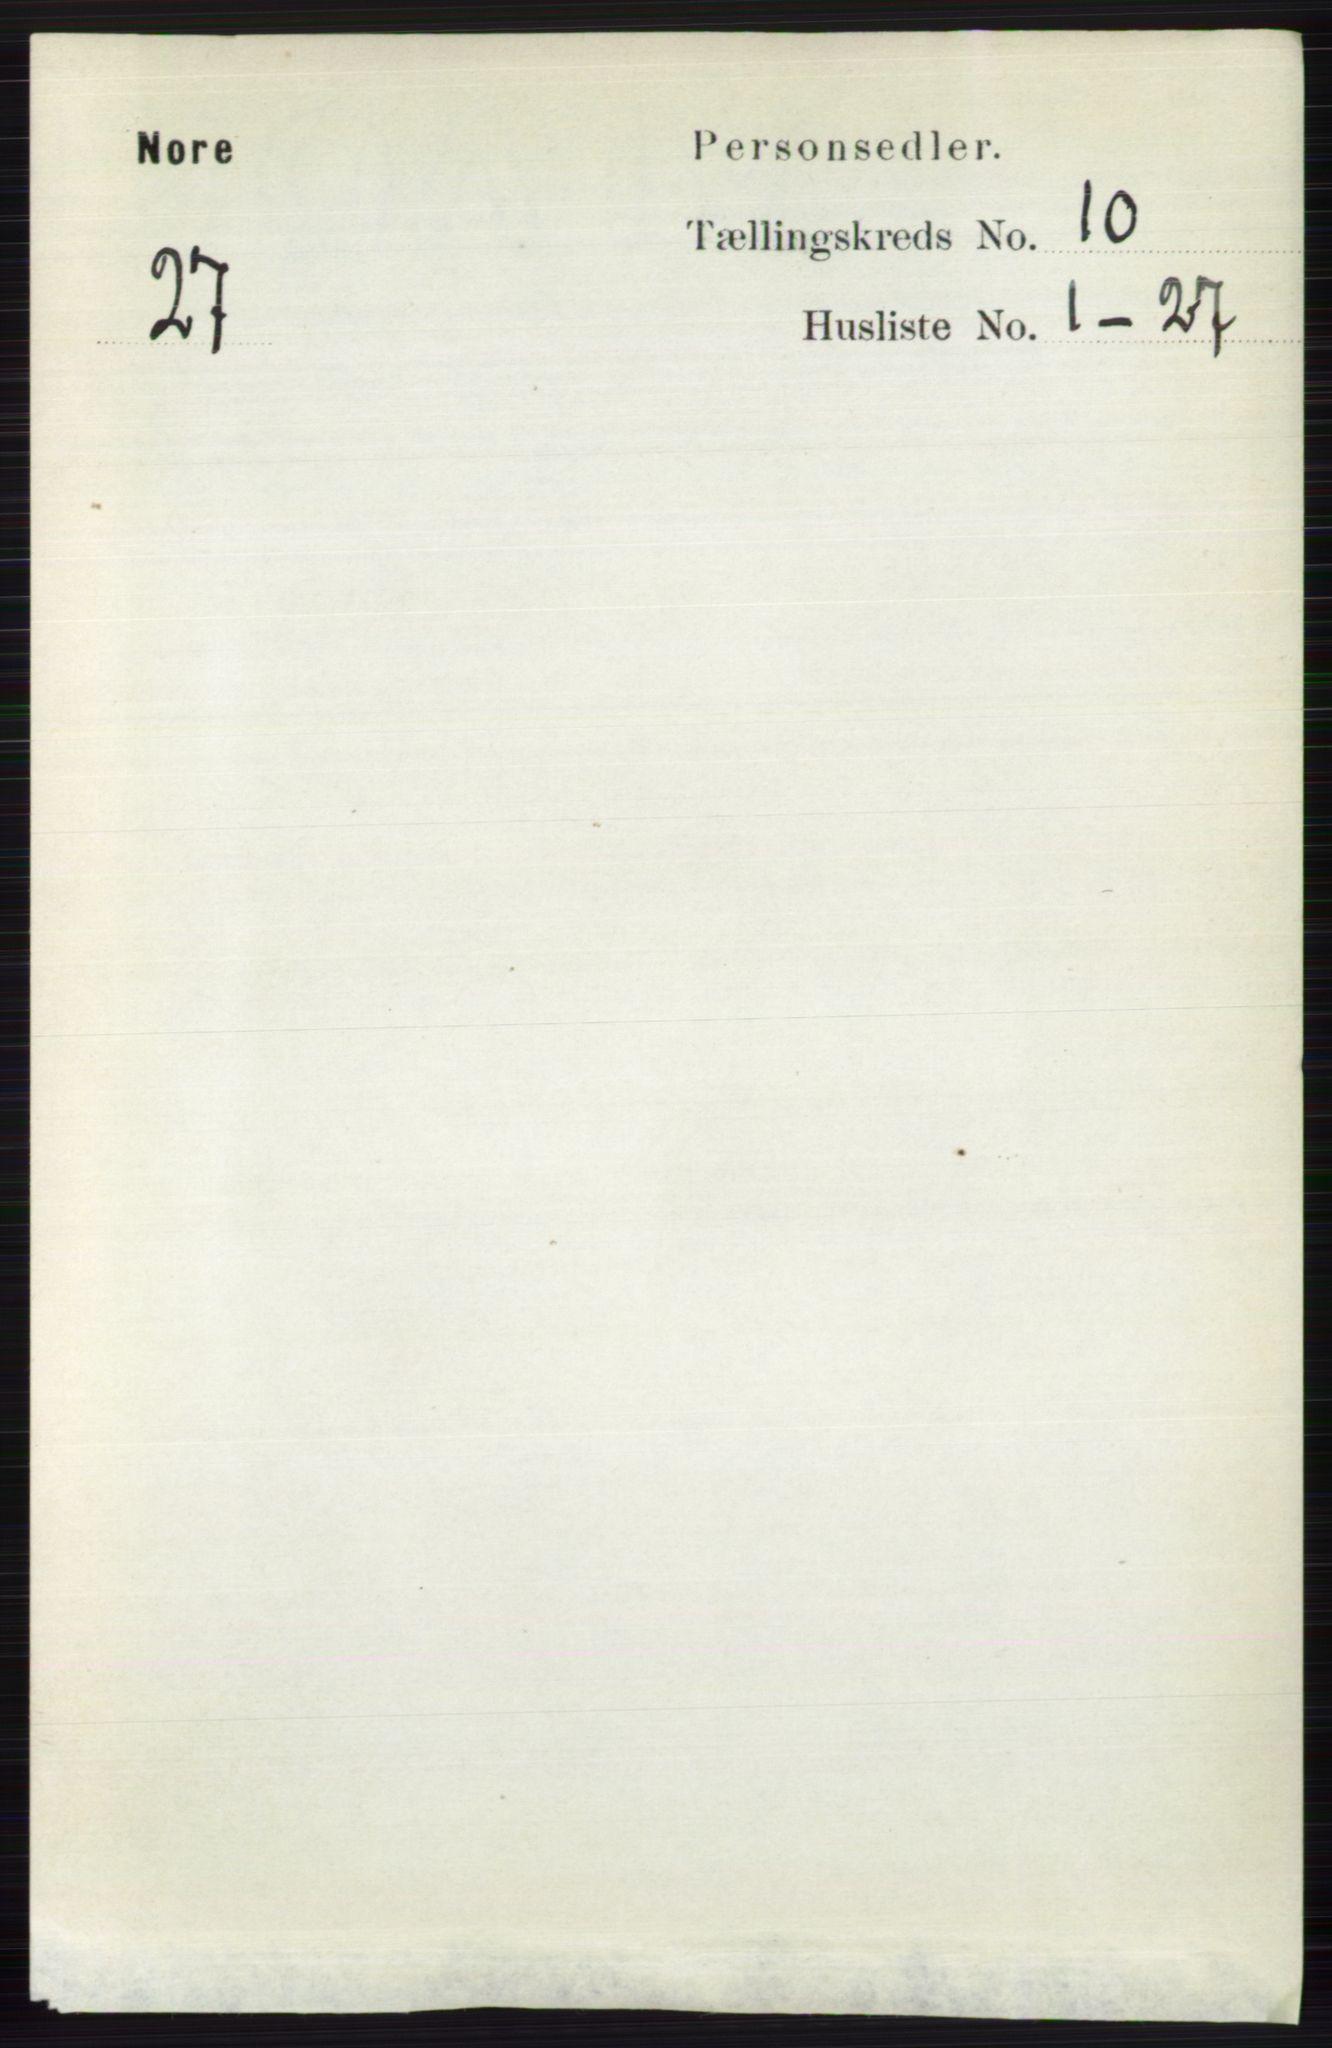 RA, Folketelling 1891 for 0633 Nore herred, 1891, s. 3544